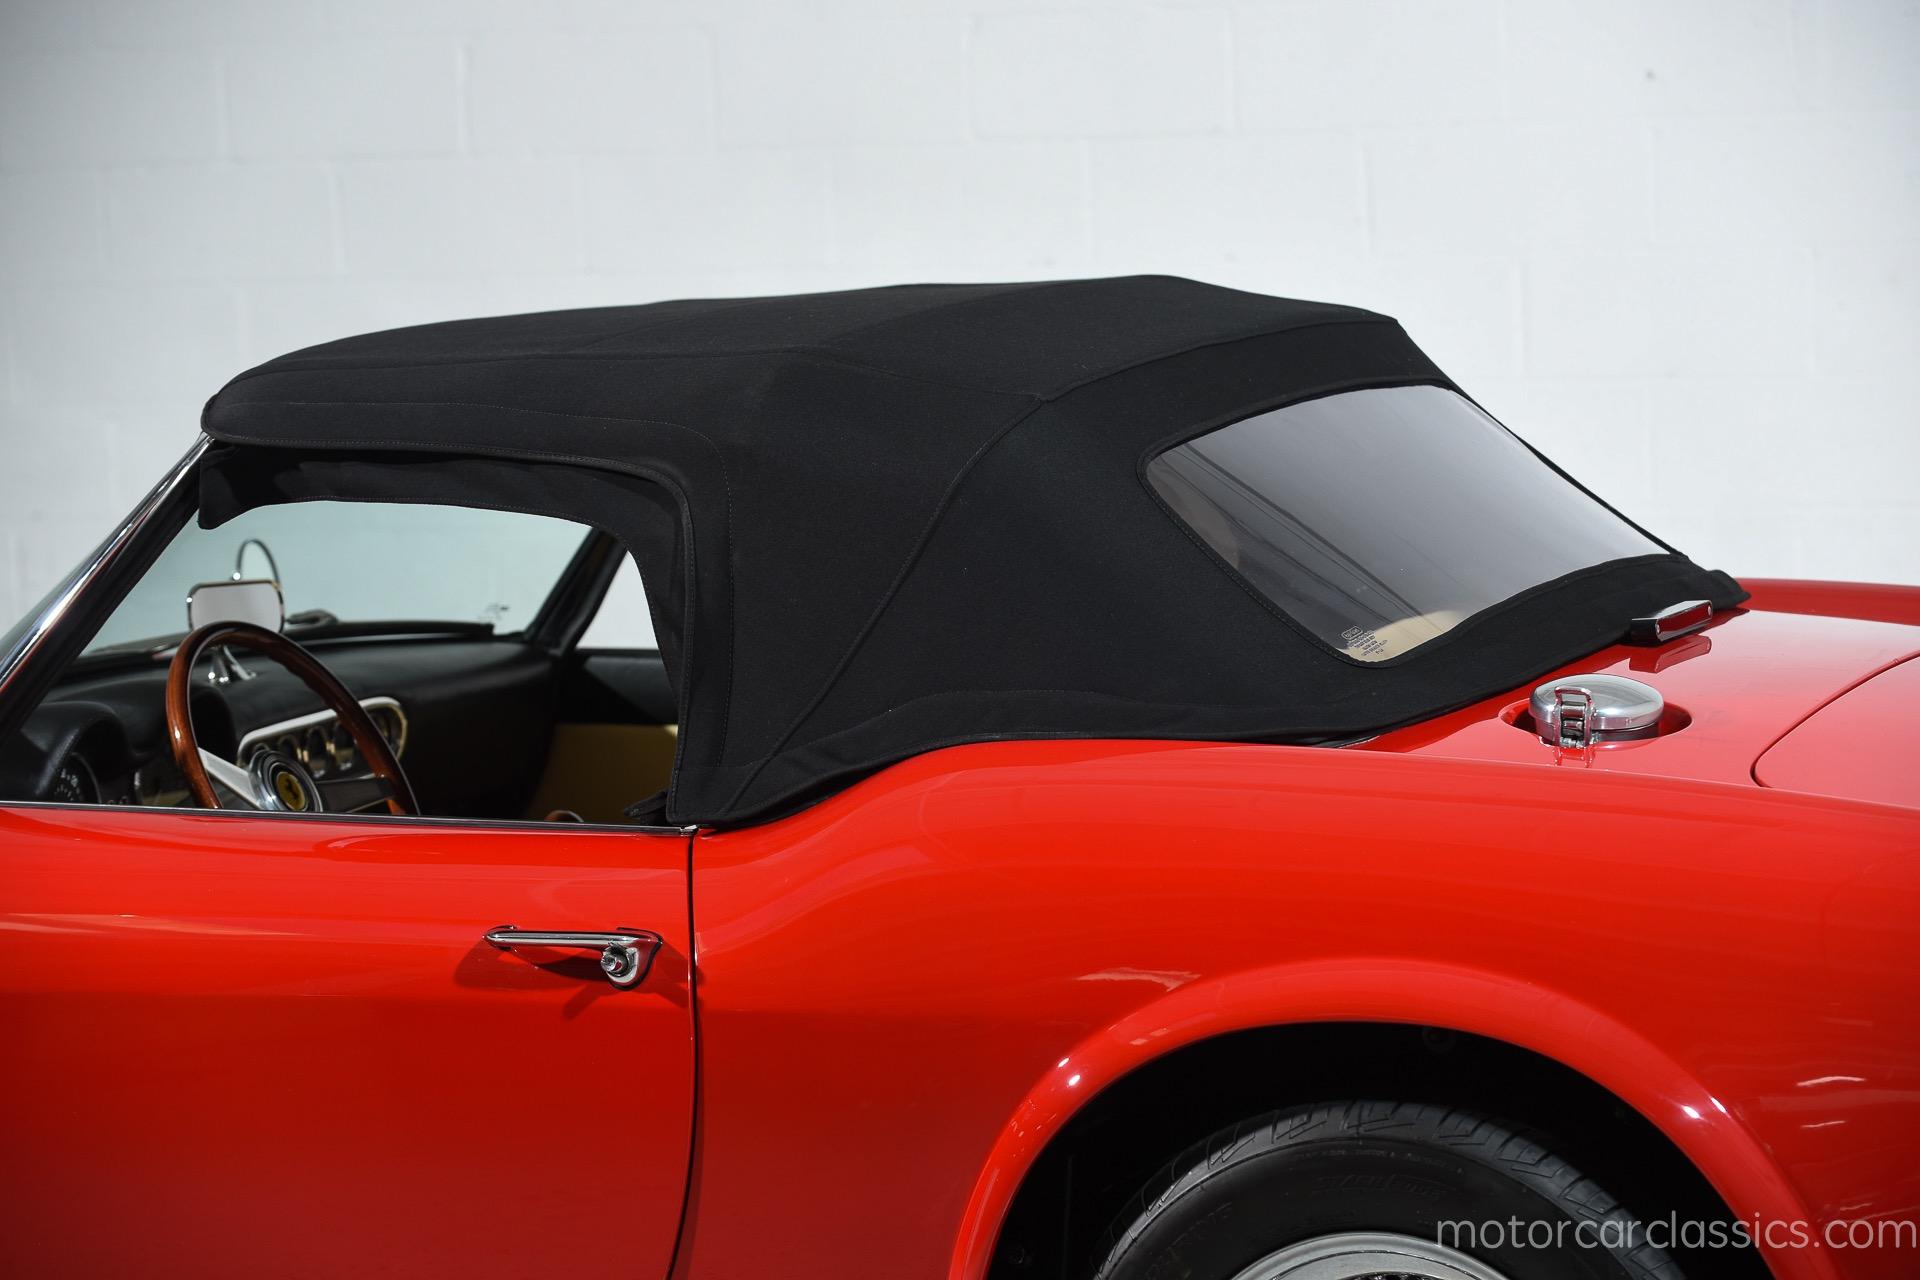 1962 Ferrari 250 GT SWB California